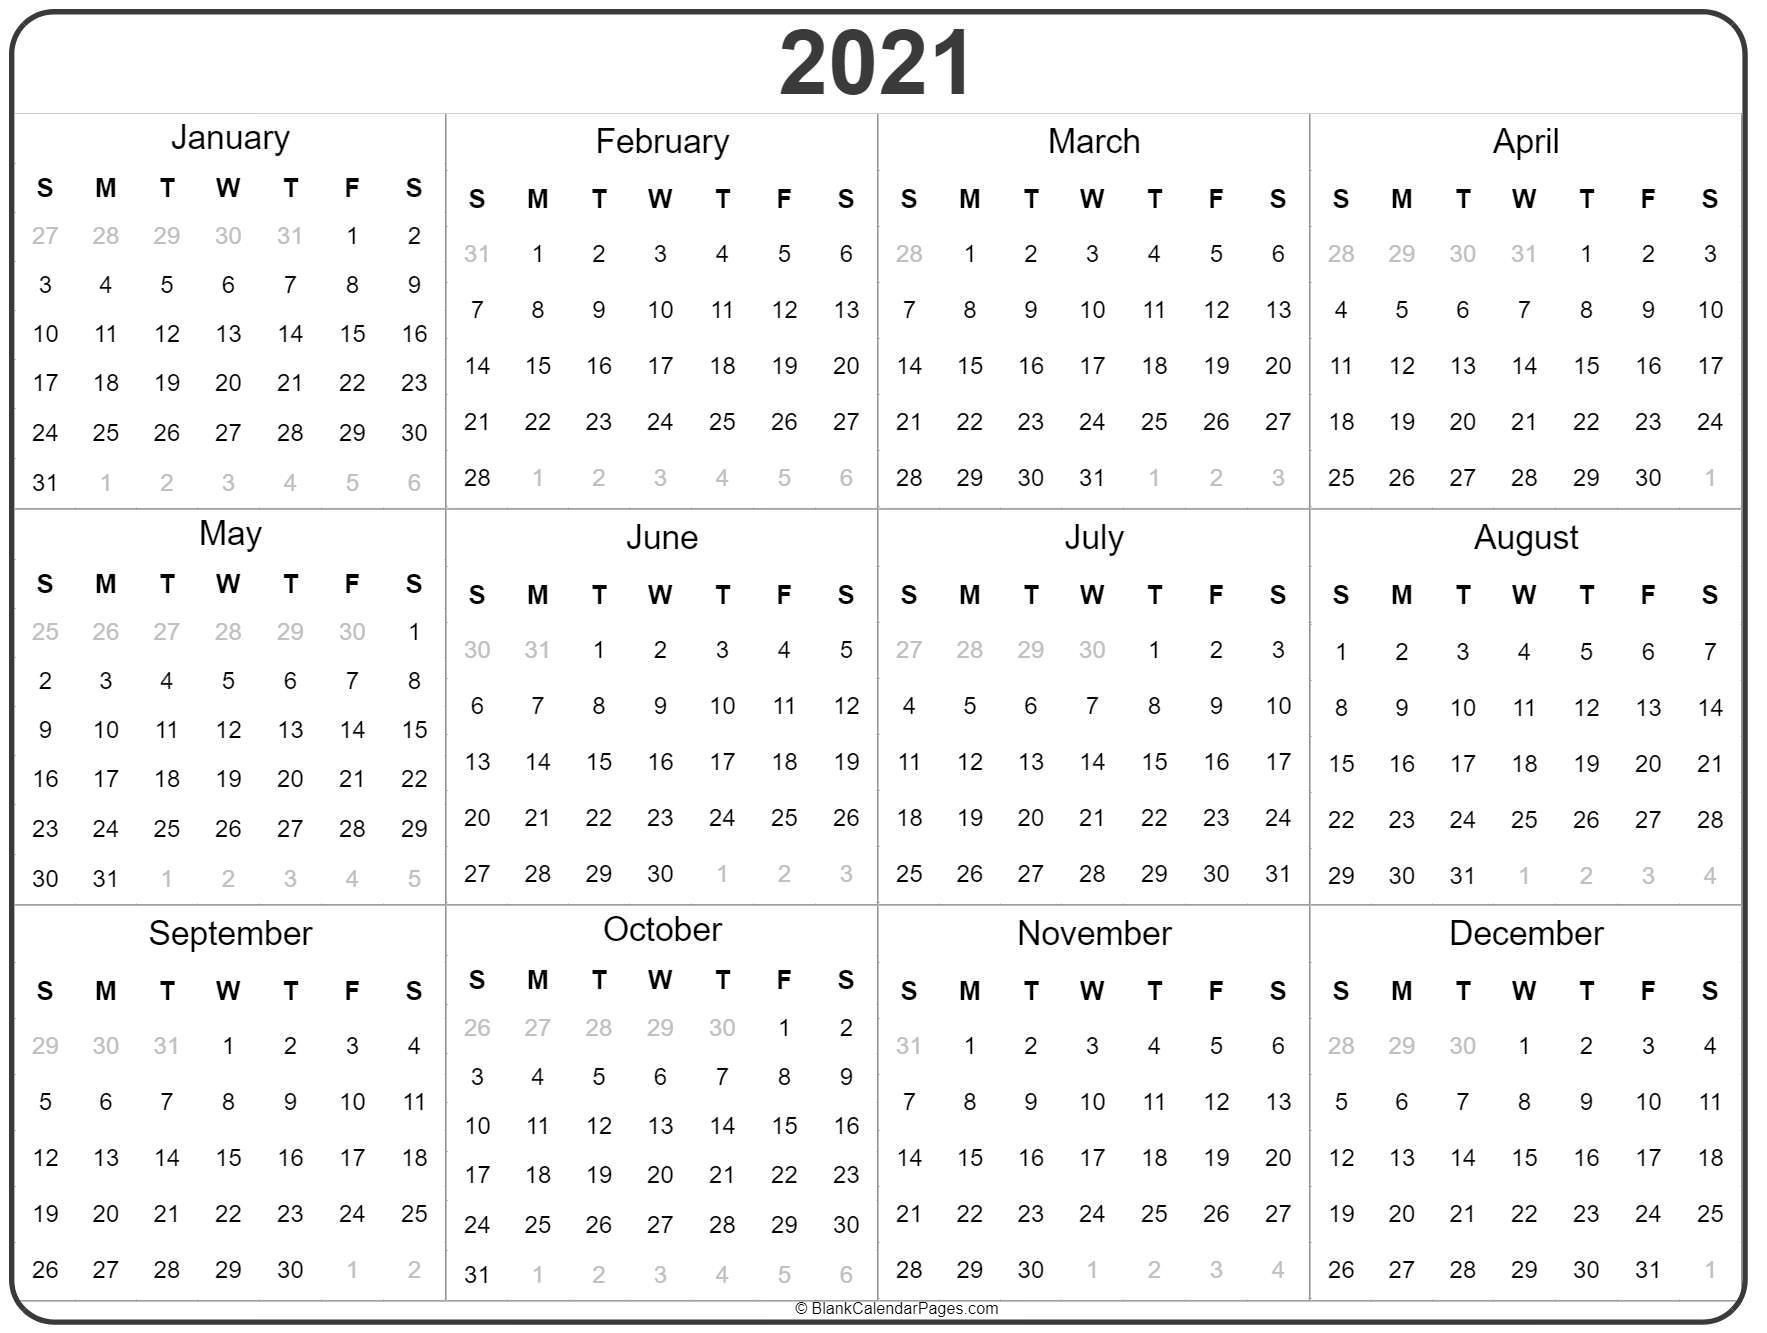 2021 Year Calendar | Yearly Printable-2021 Year Calendar Printable